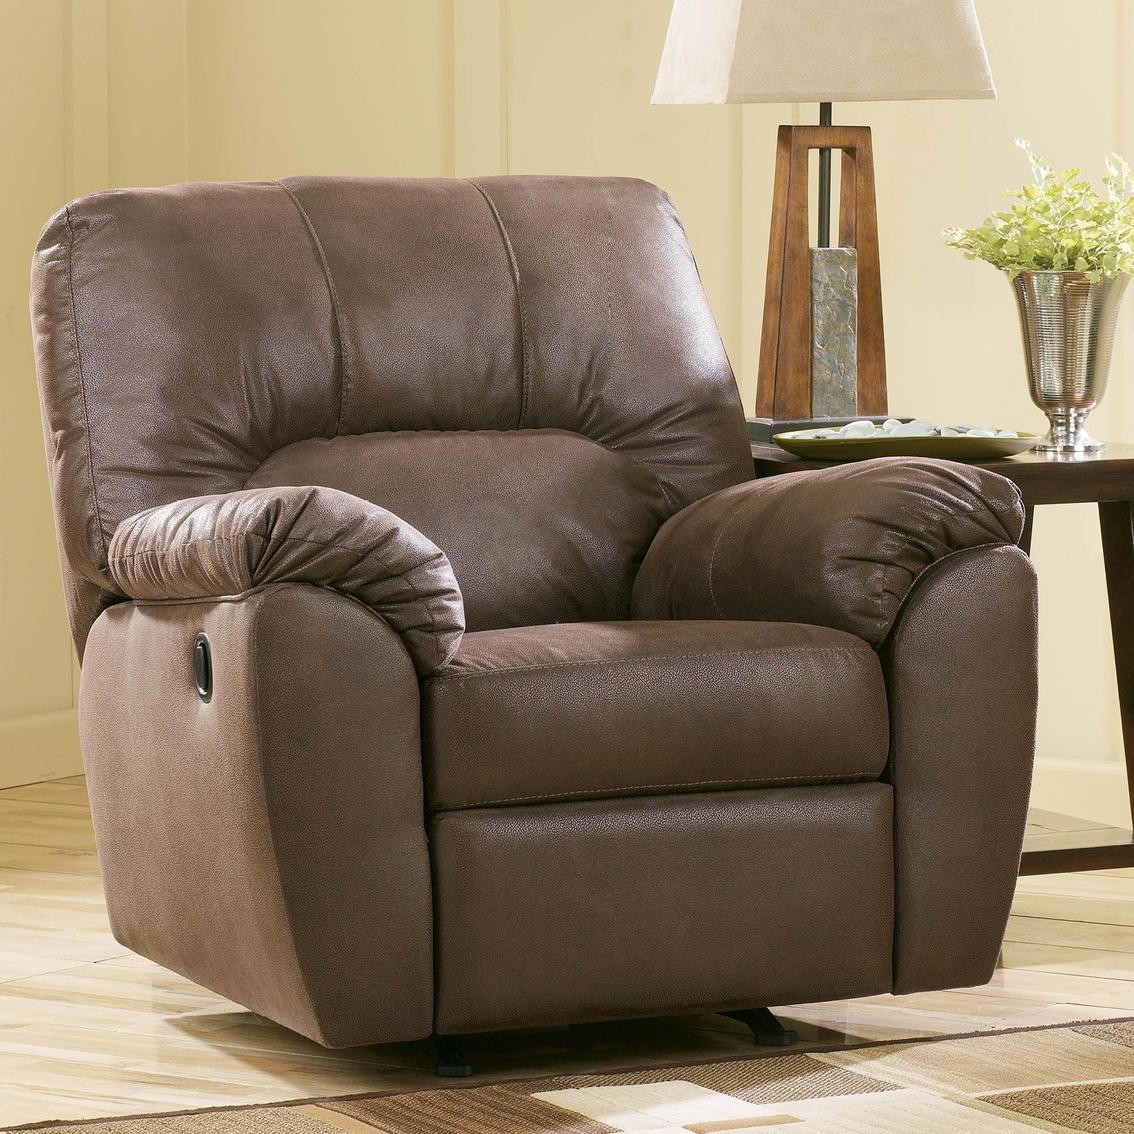 Ashley Amazon Walnut Rocker Recliner Ashley Furniture